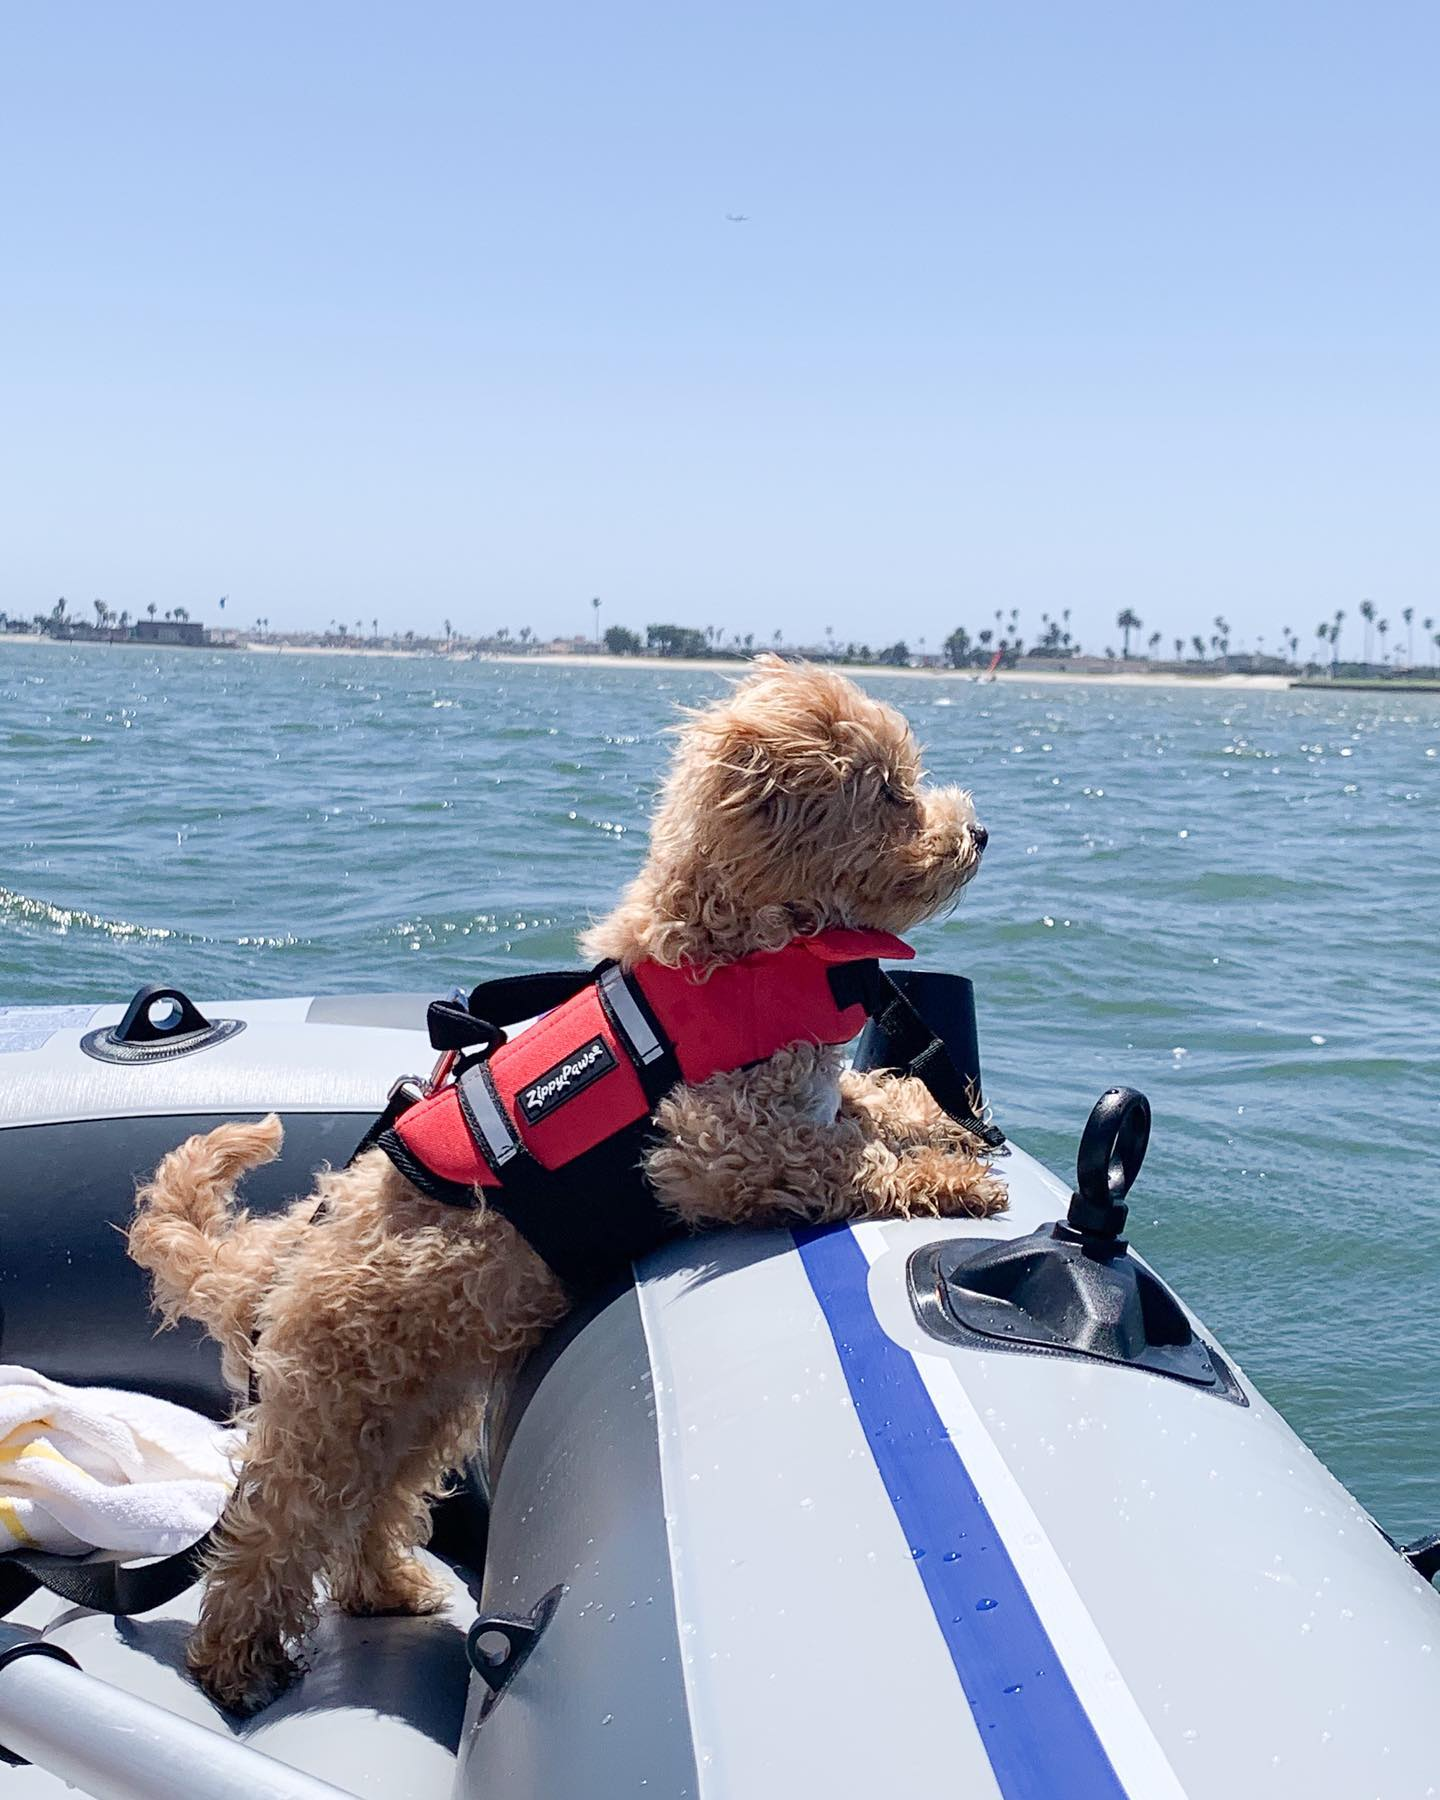 zp-dog-life-jacket-red-7